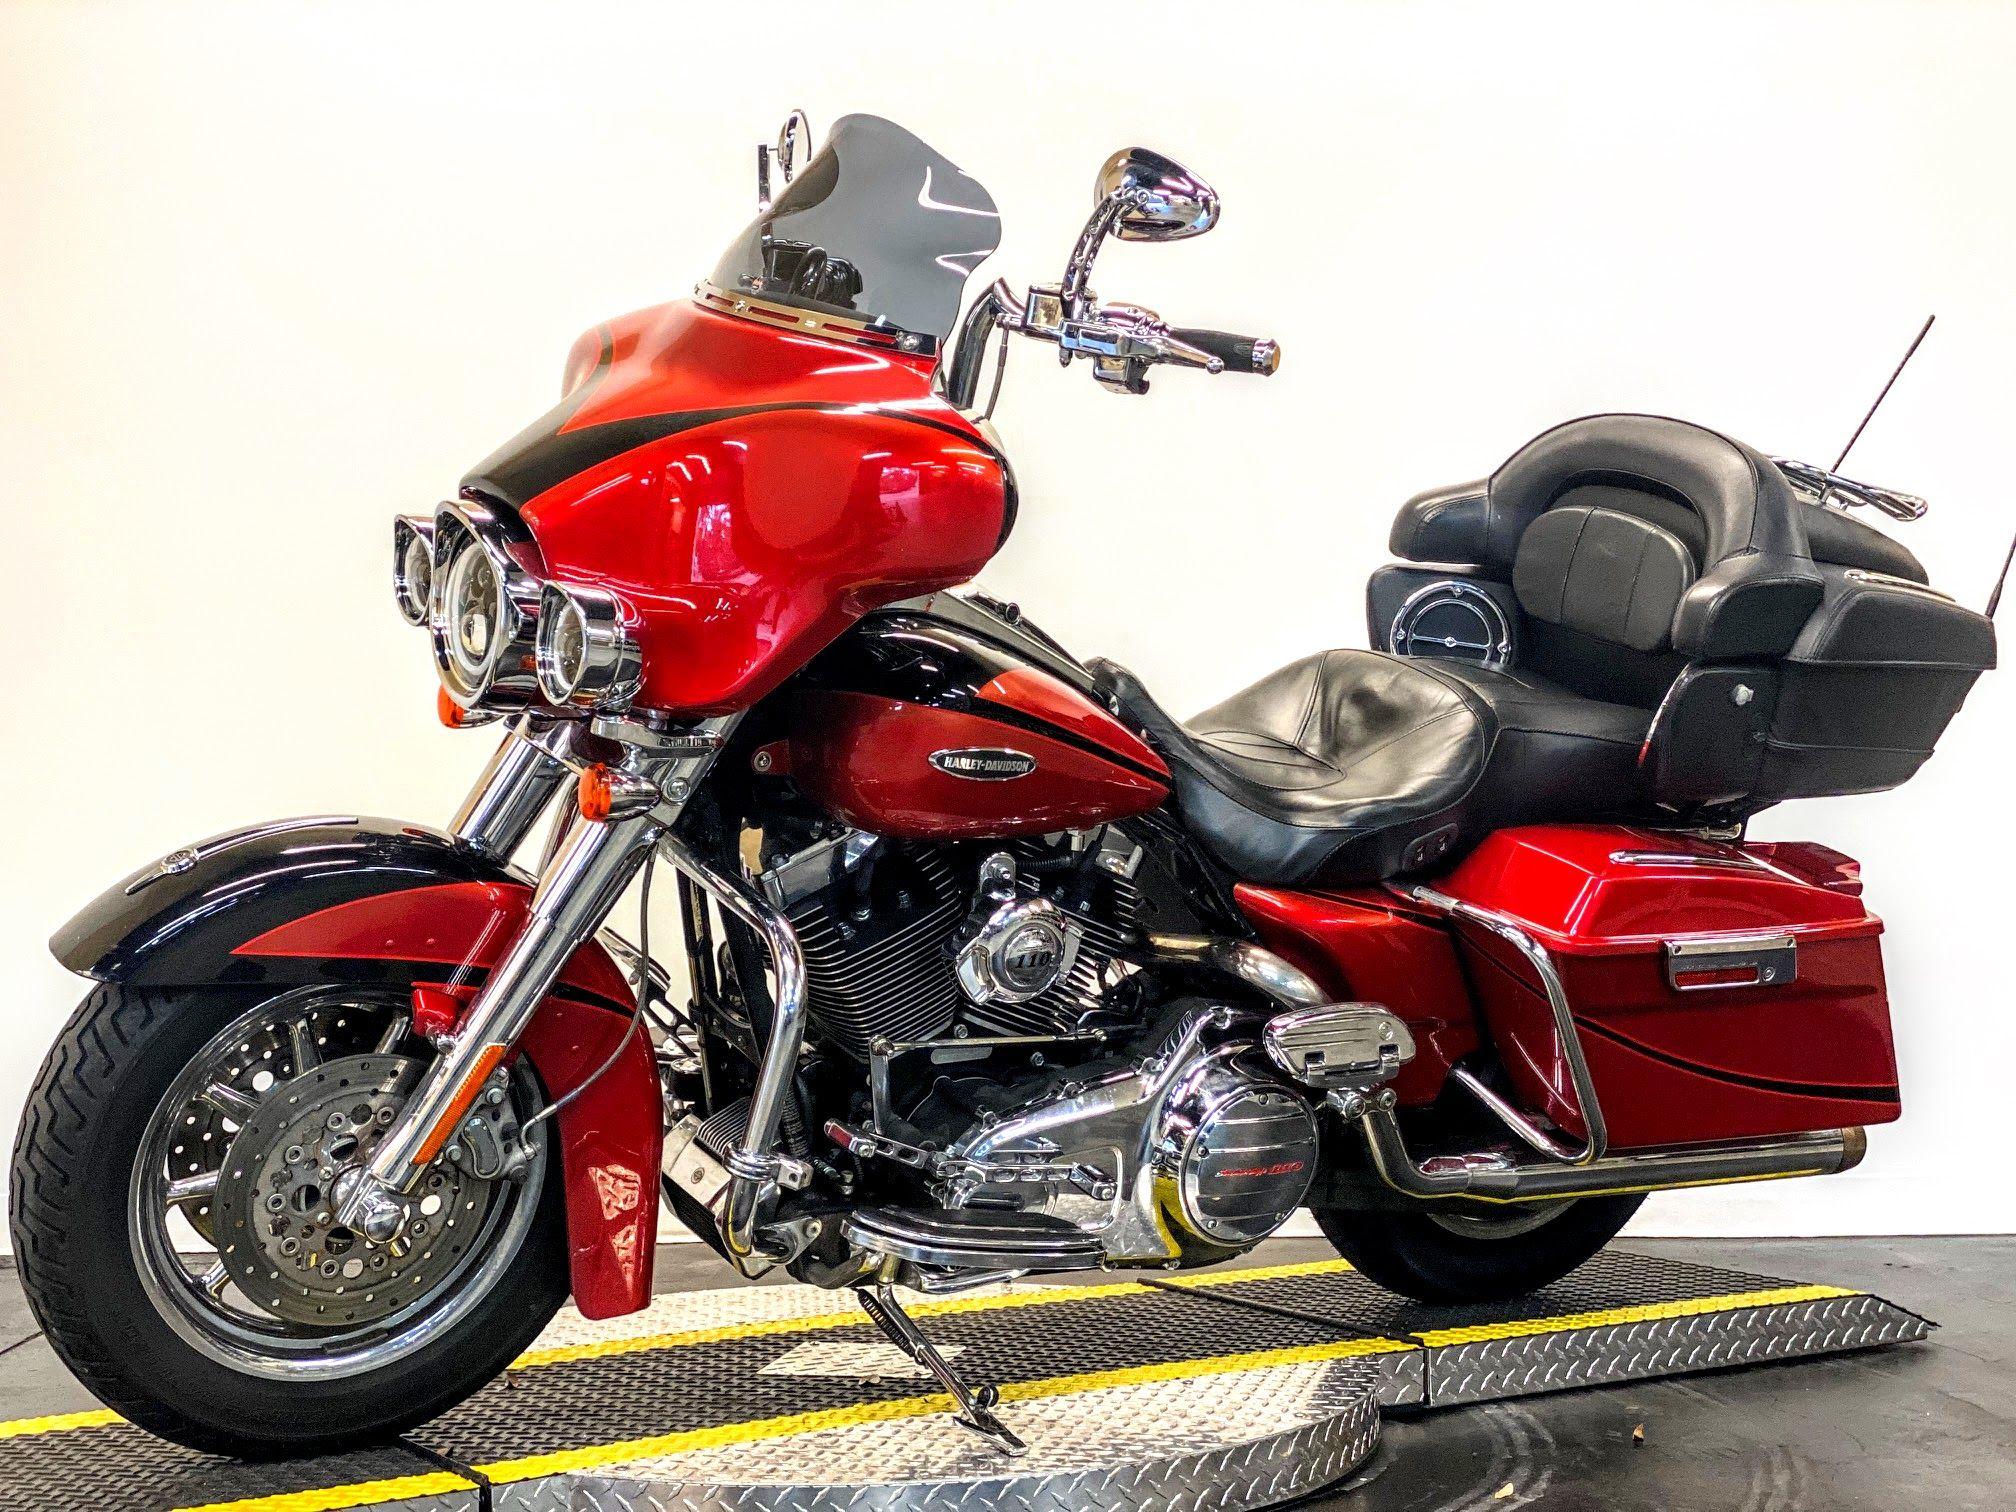 Pre-Owned 2007 Harley-Davidson Screaming Eagle Electra Glide